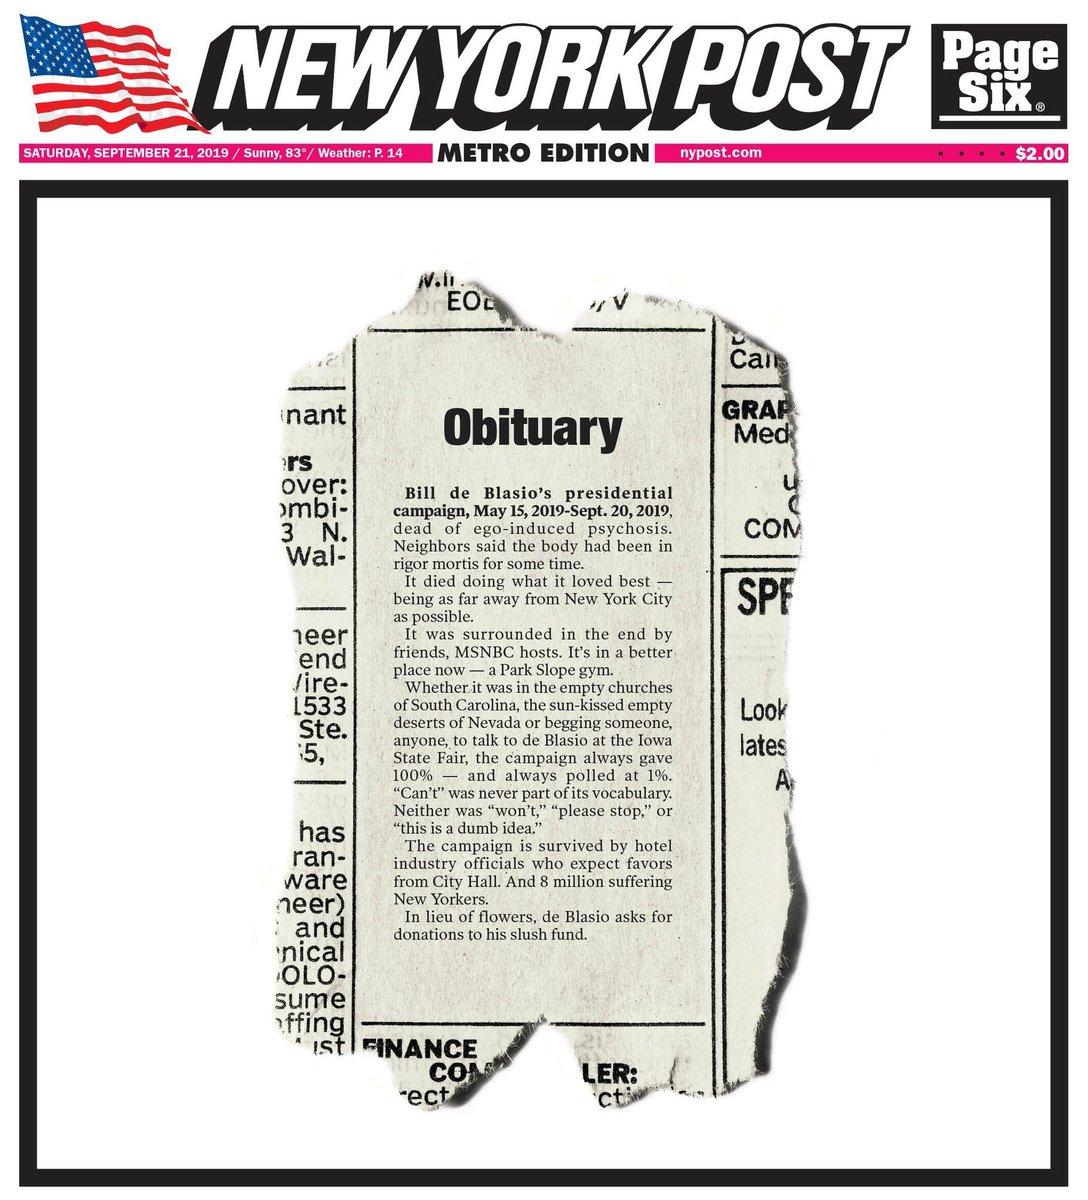 New York Post Declares De Blasio's 2020 Bid 'Dead Of Ego-Induced Psychosis'